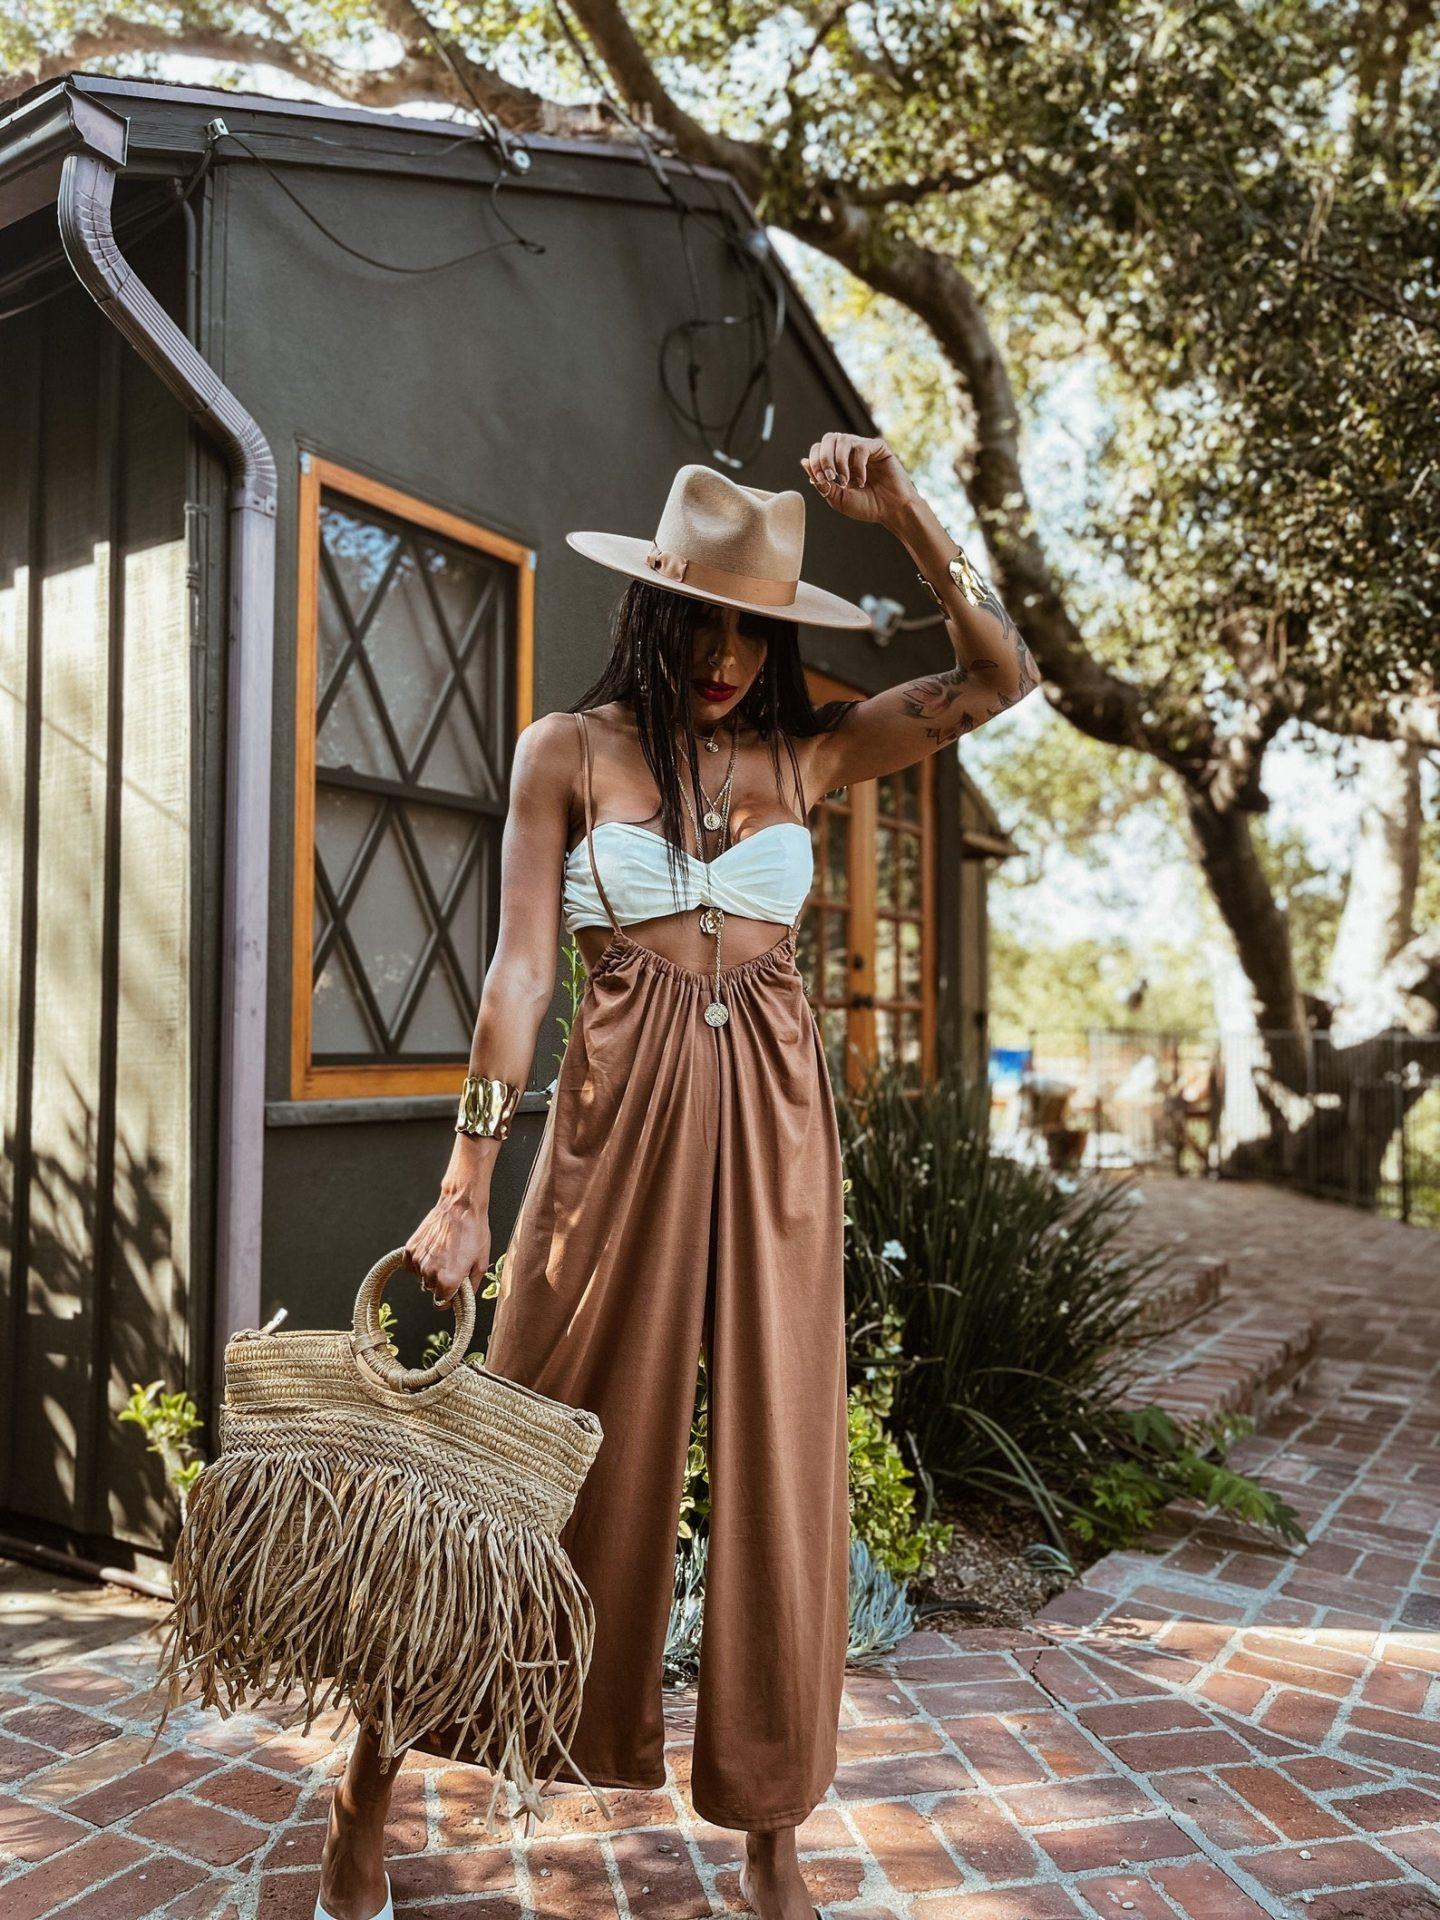 Tan bohemian pants with suspenders and hay bag